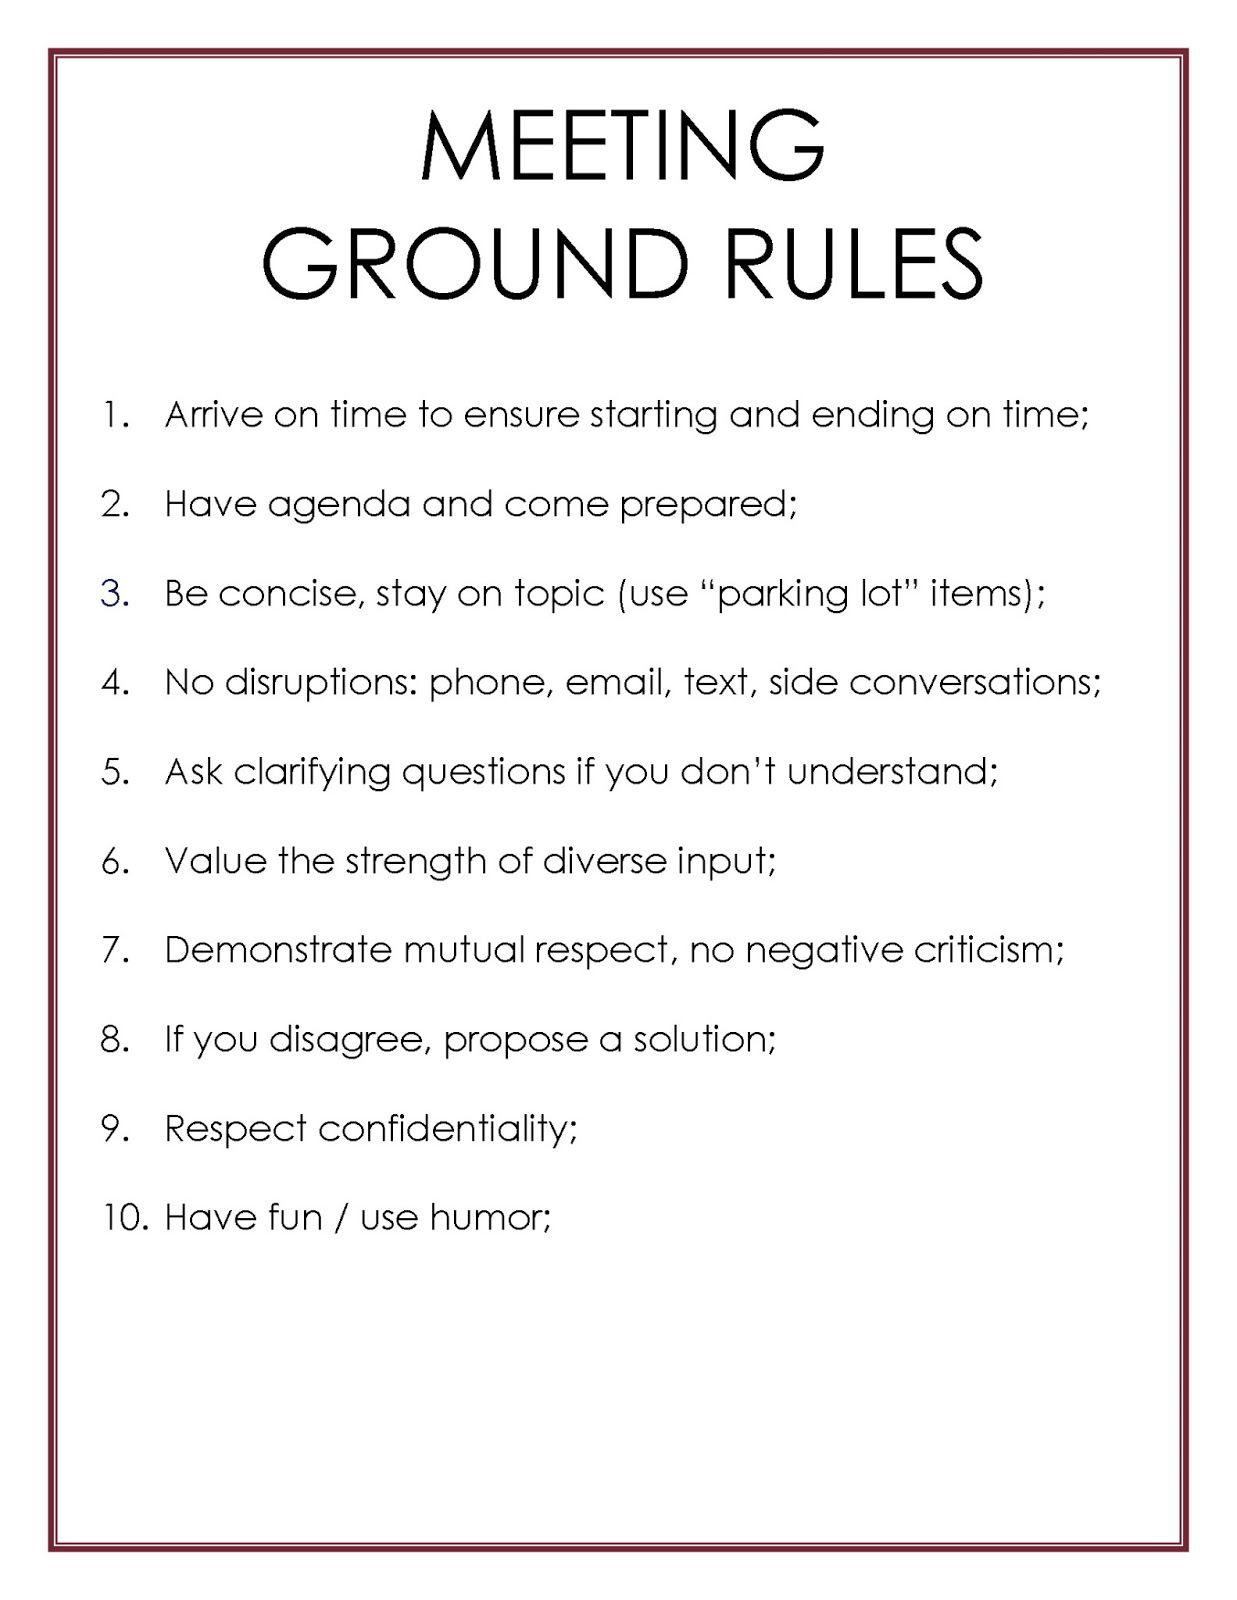 Mycoachken Meetings Ground Rules